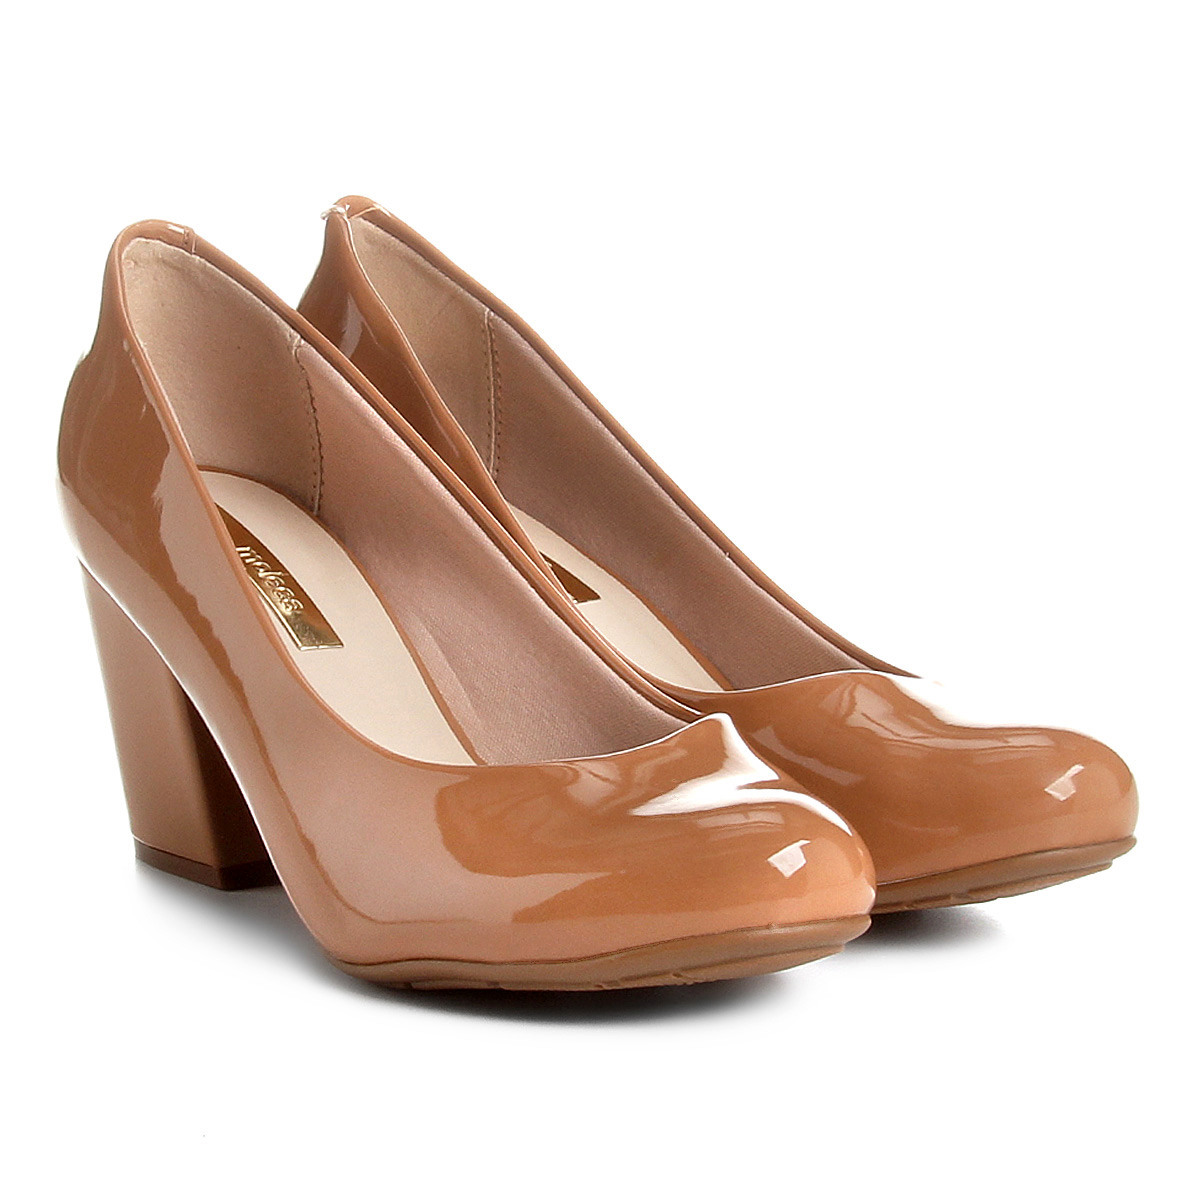 aa9f32f799 Sapato Moleca Boneca Verniz Feminino Nude - Compre Agora